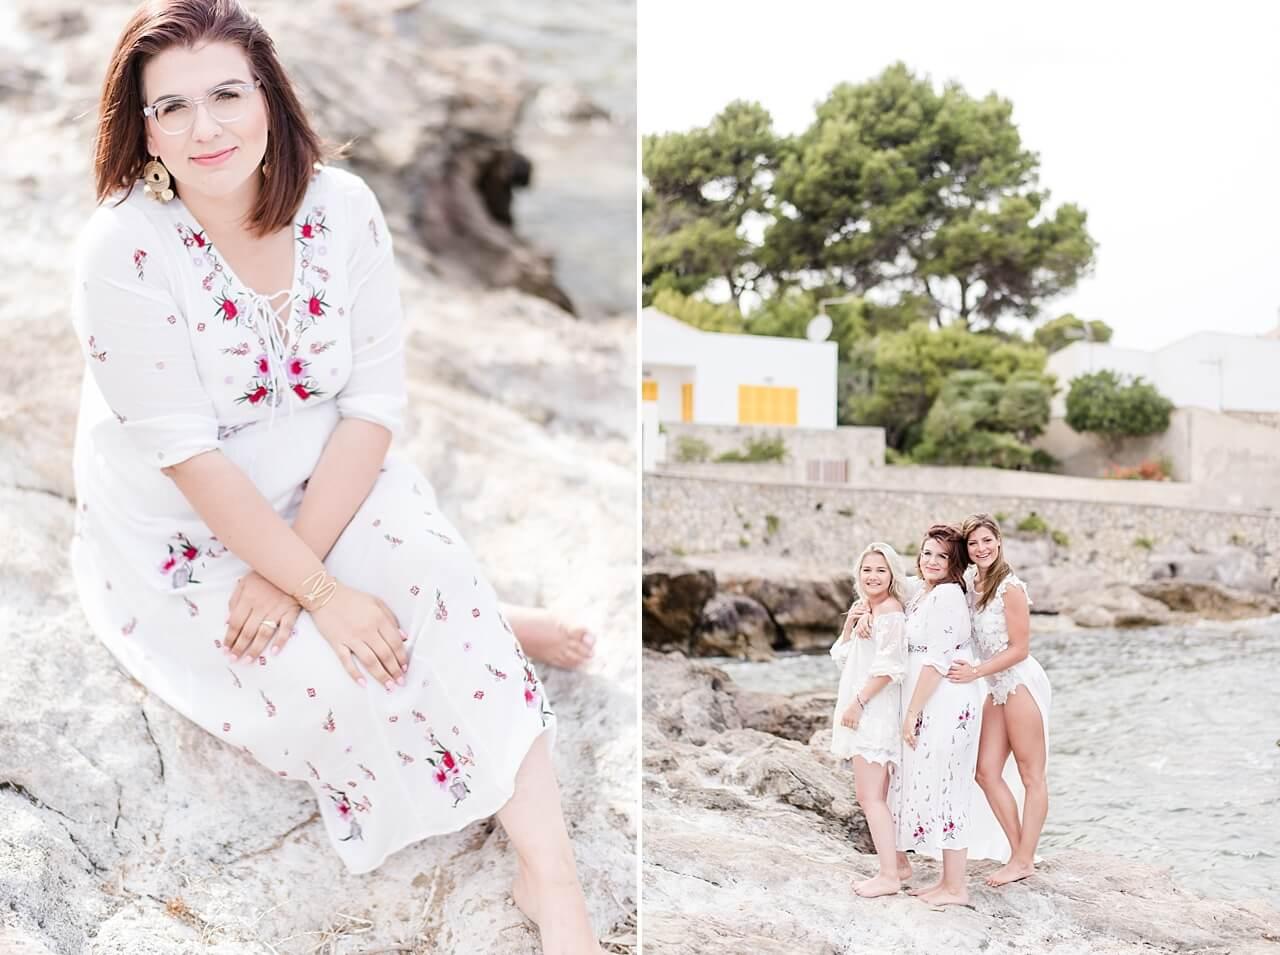 Rebecca Conte Fotografie: Freundinnen-Shooting auf Mallorca 06